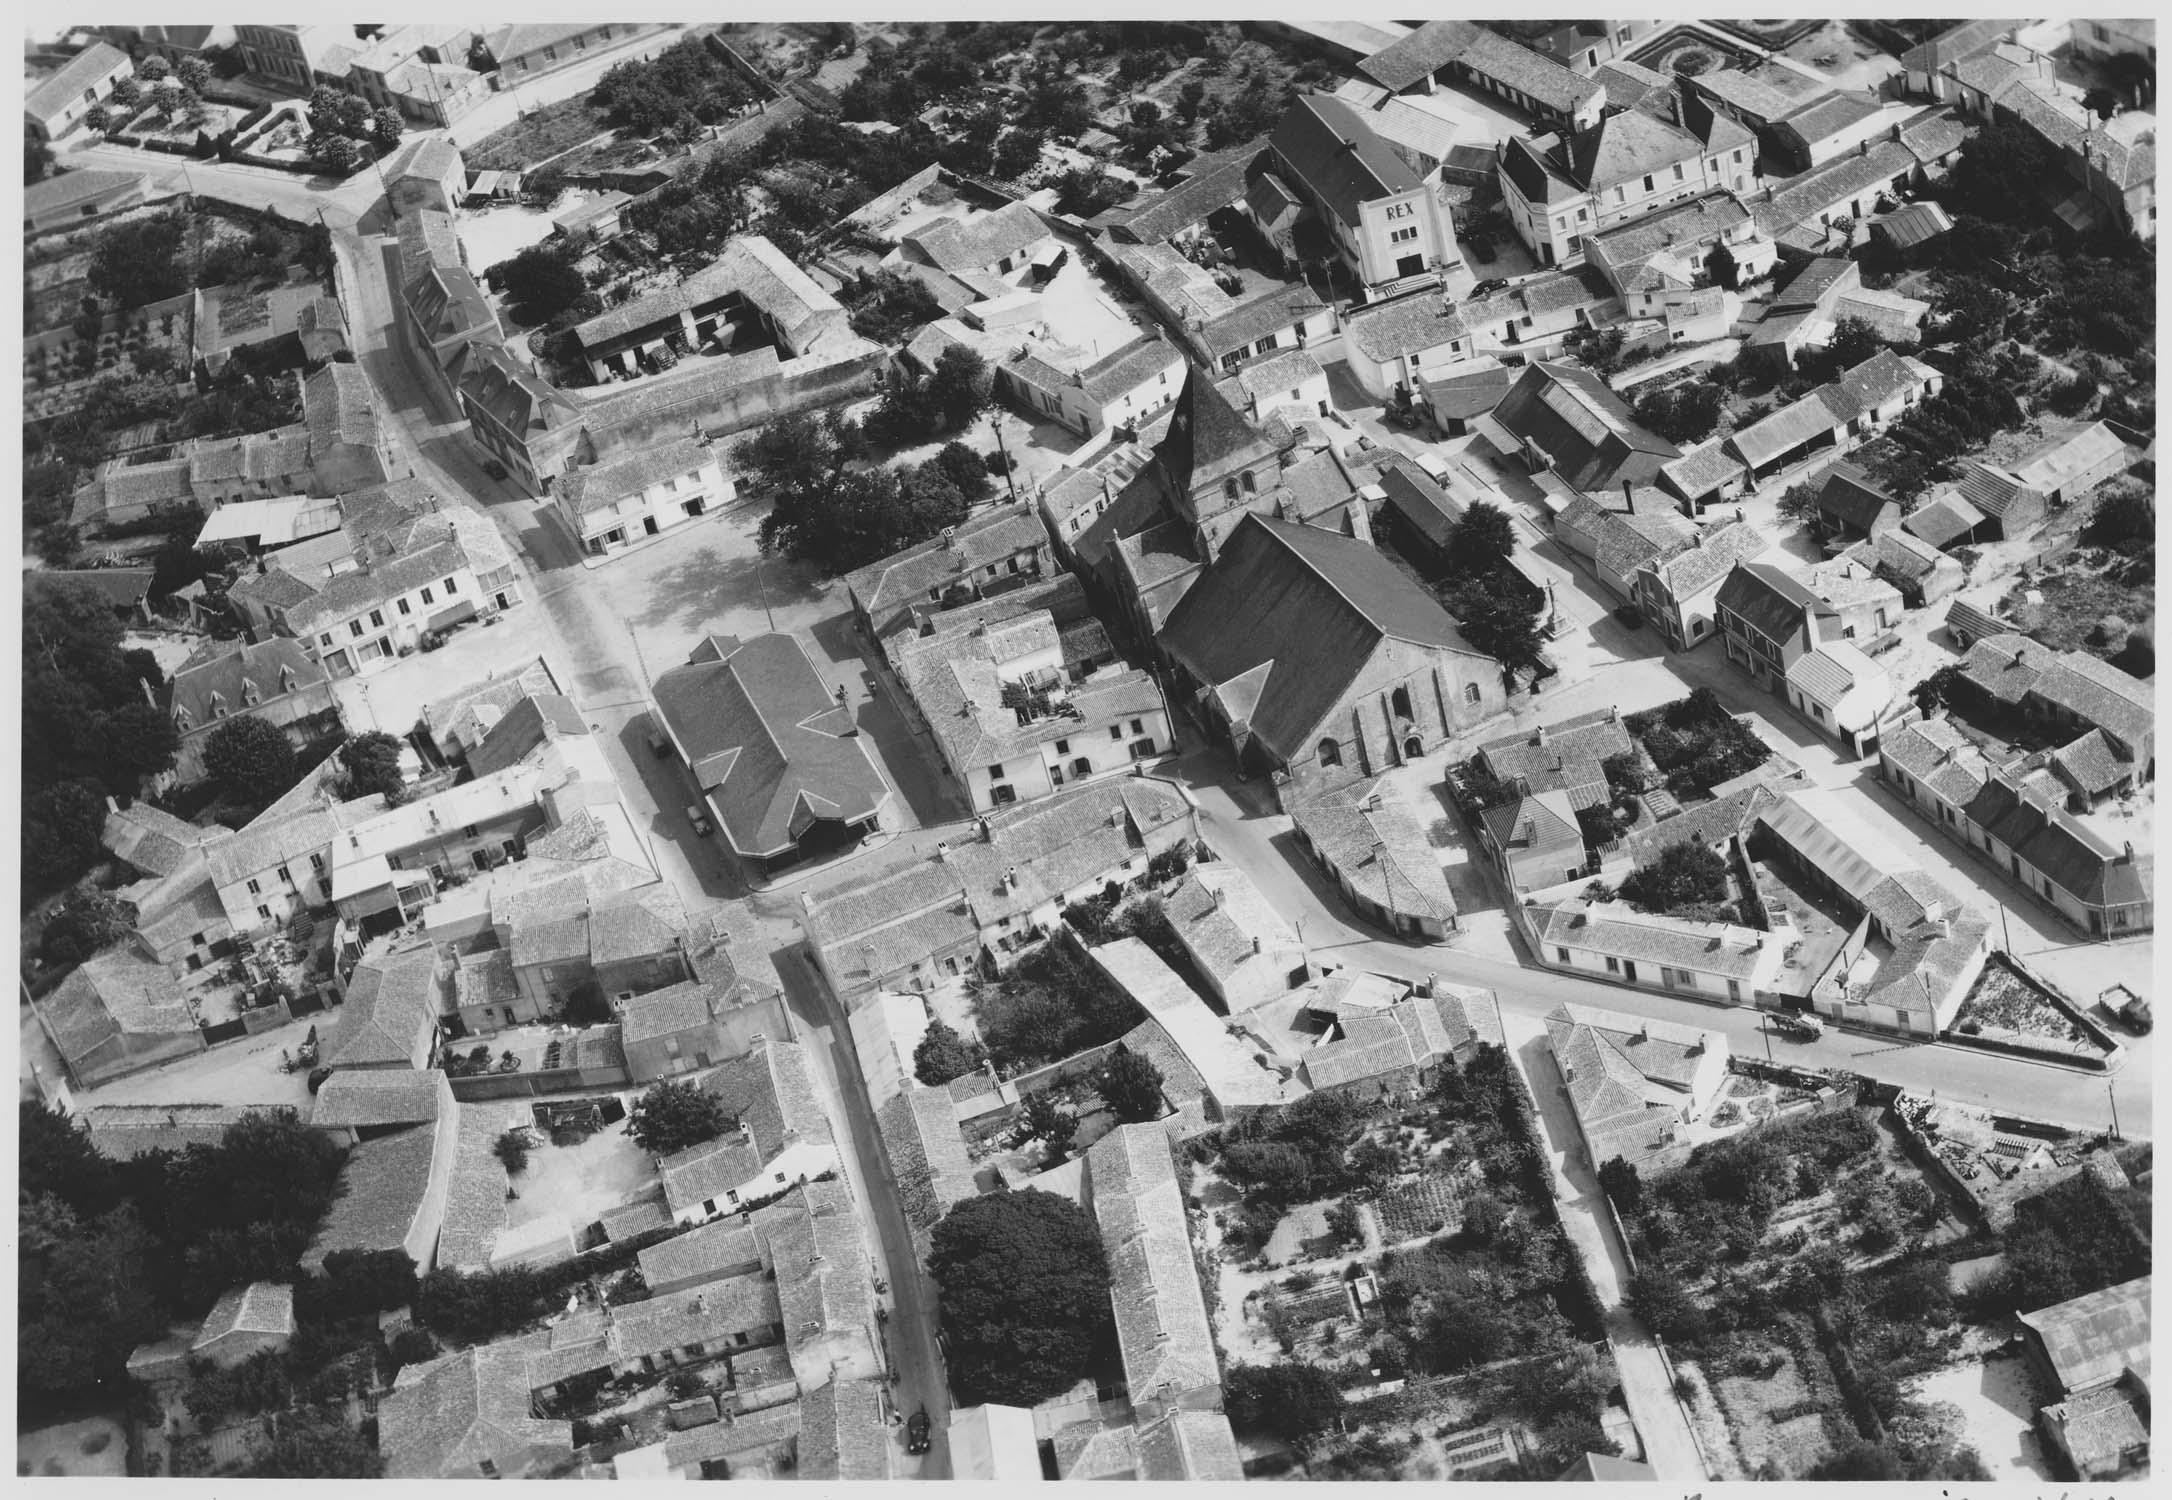 Eglise Saint-Philibert